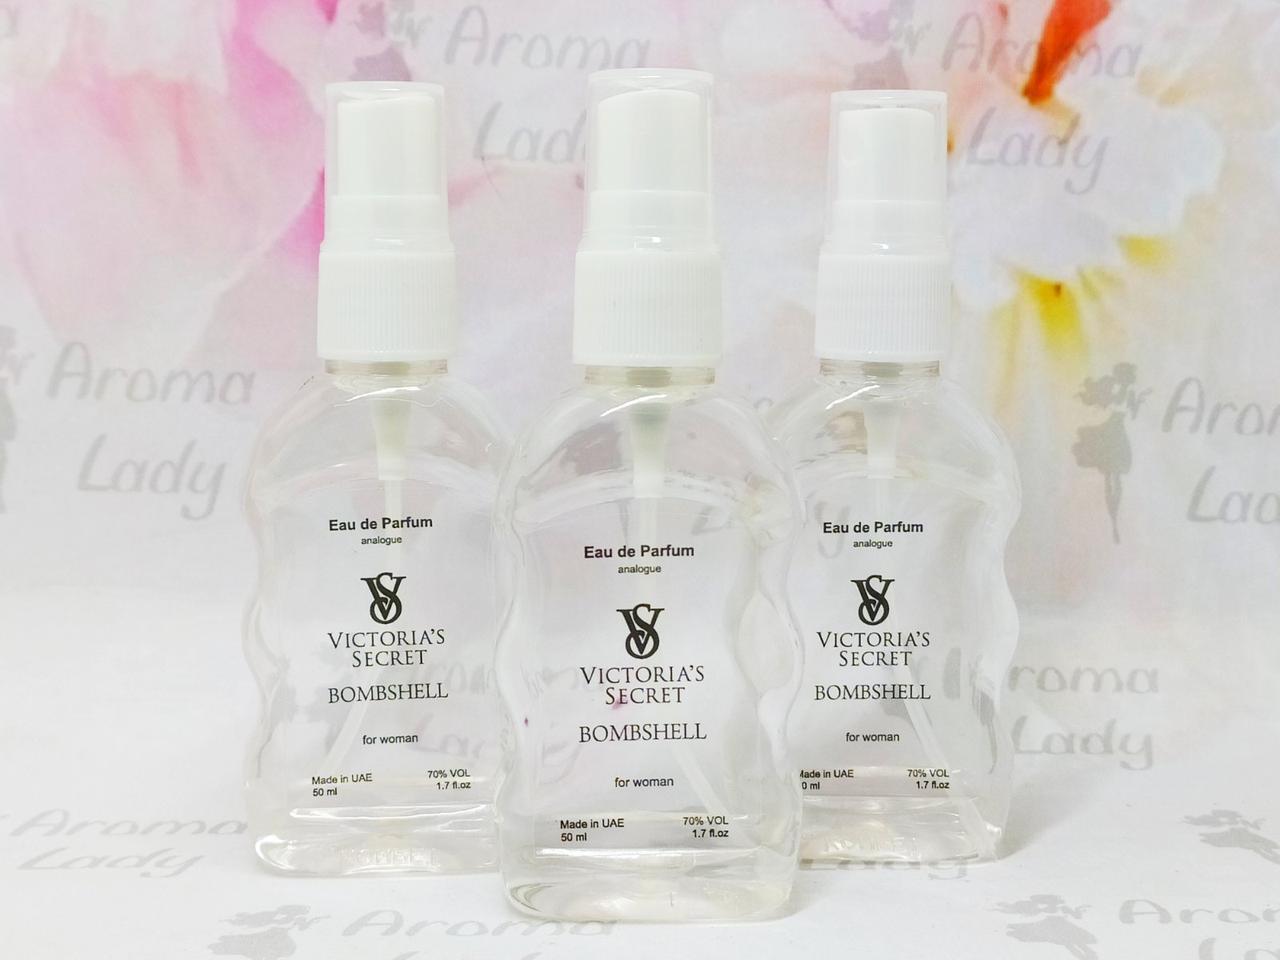 Женская парфюмерная вода Victoria Secret Bombshell (Виктория Сикрет бомбшелл) 50 мл